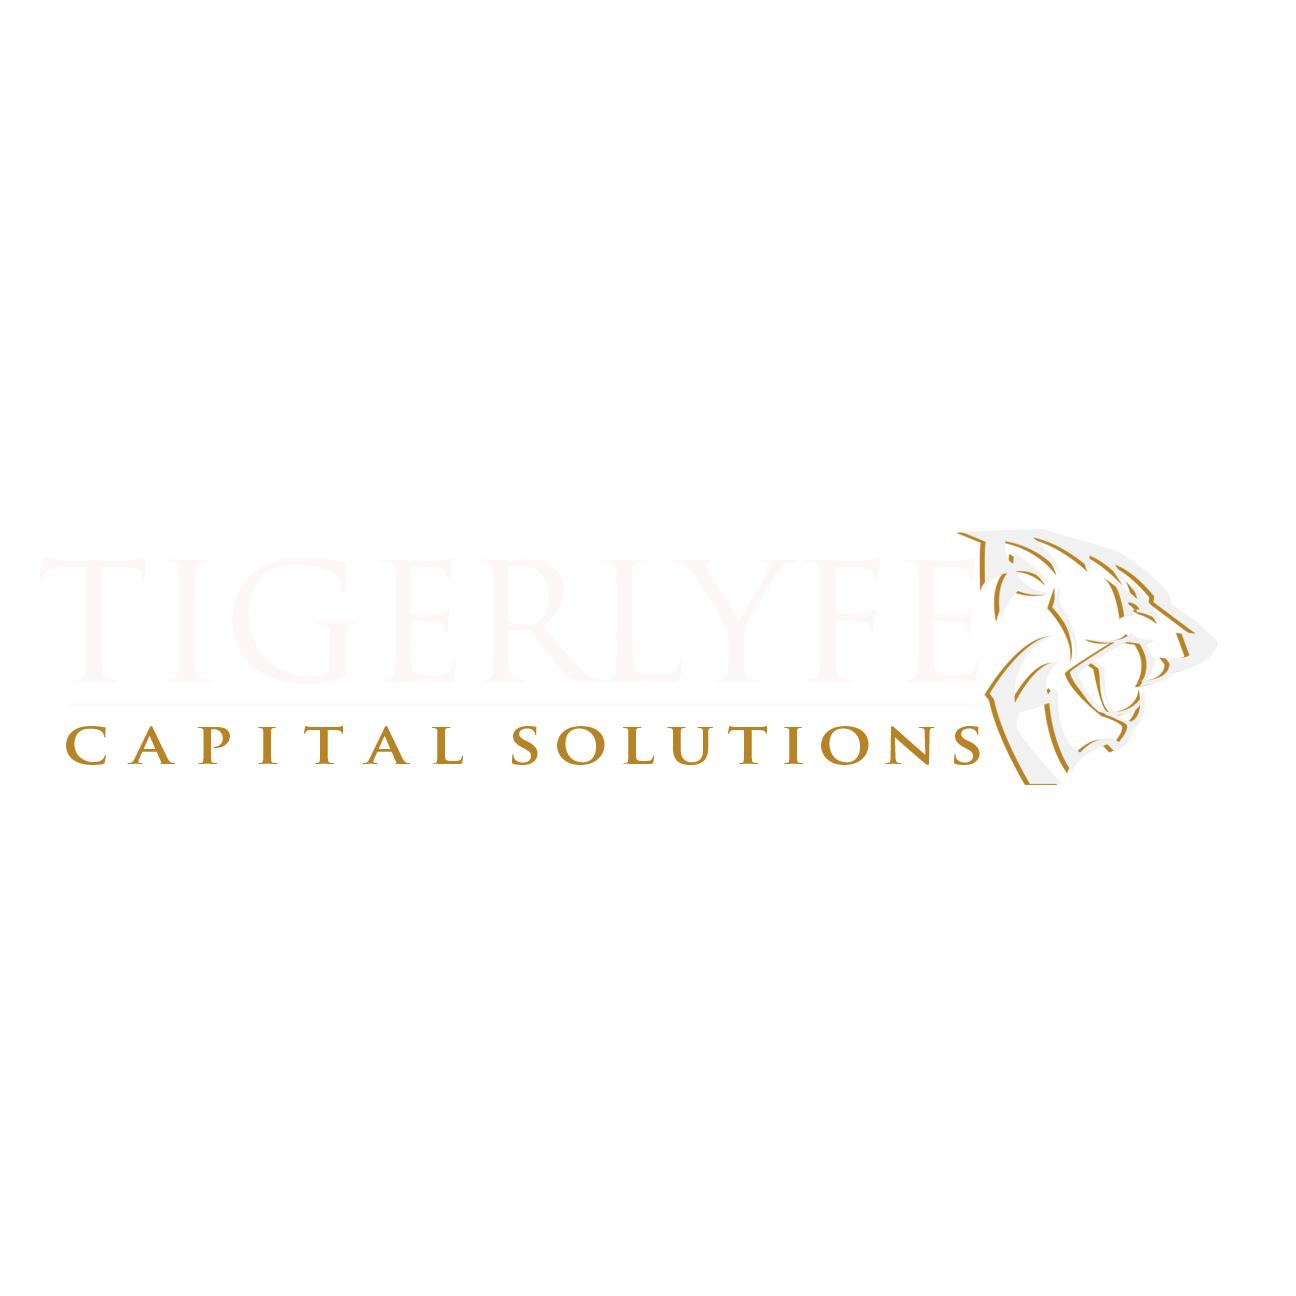 TIGERLYFE CAPITAL SOLUTIONS